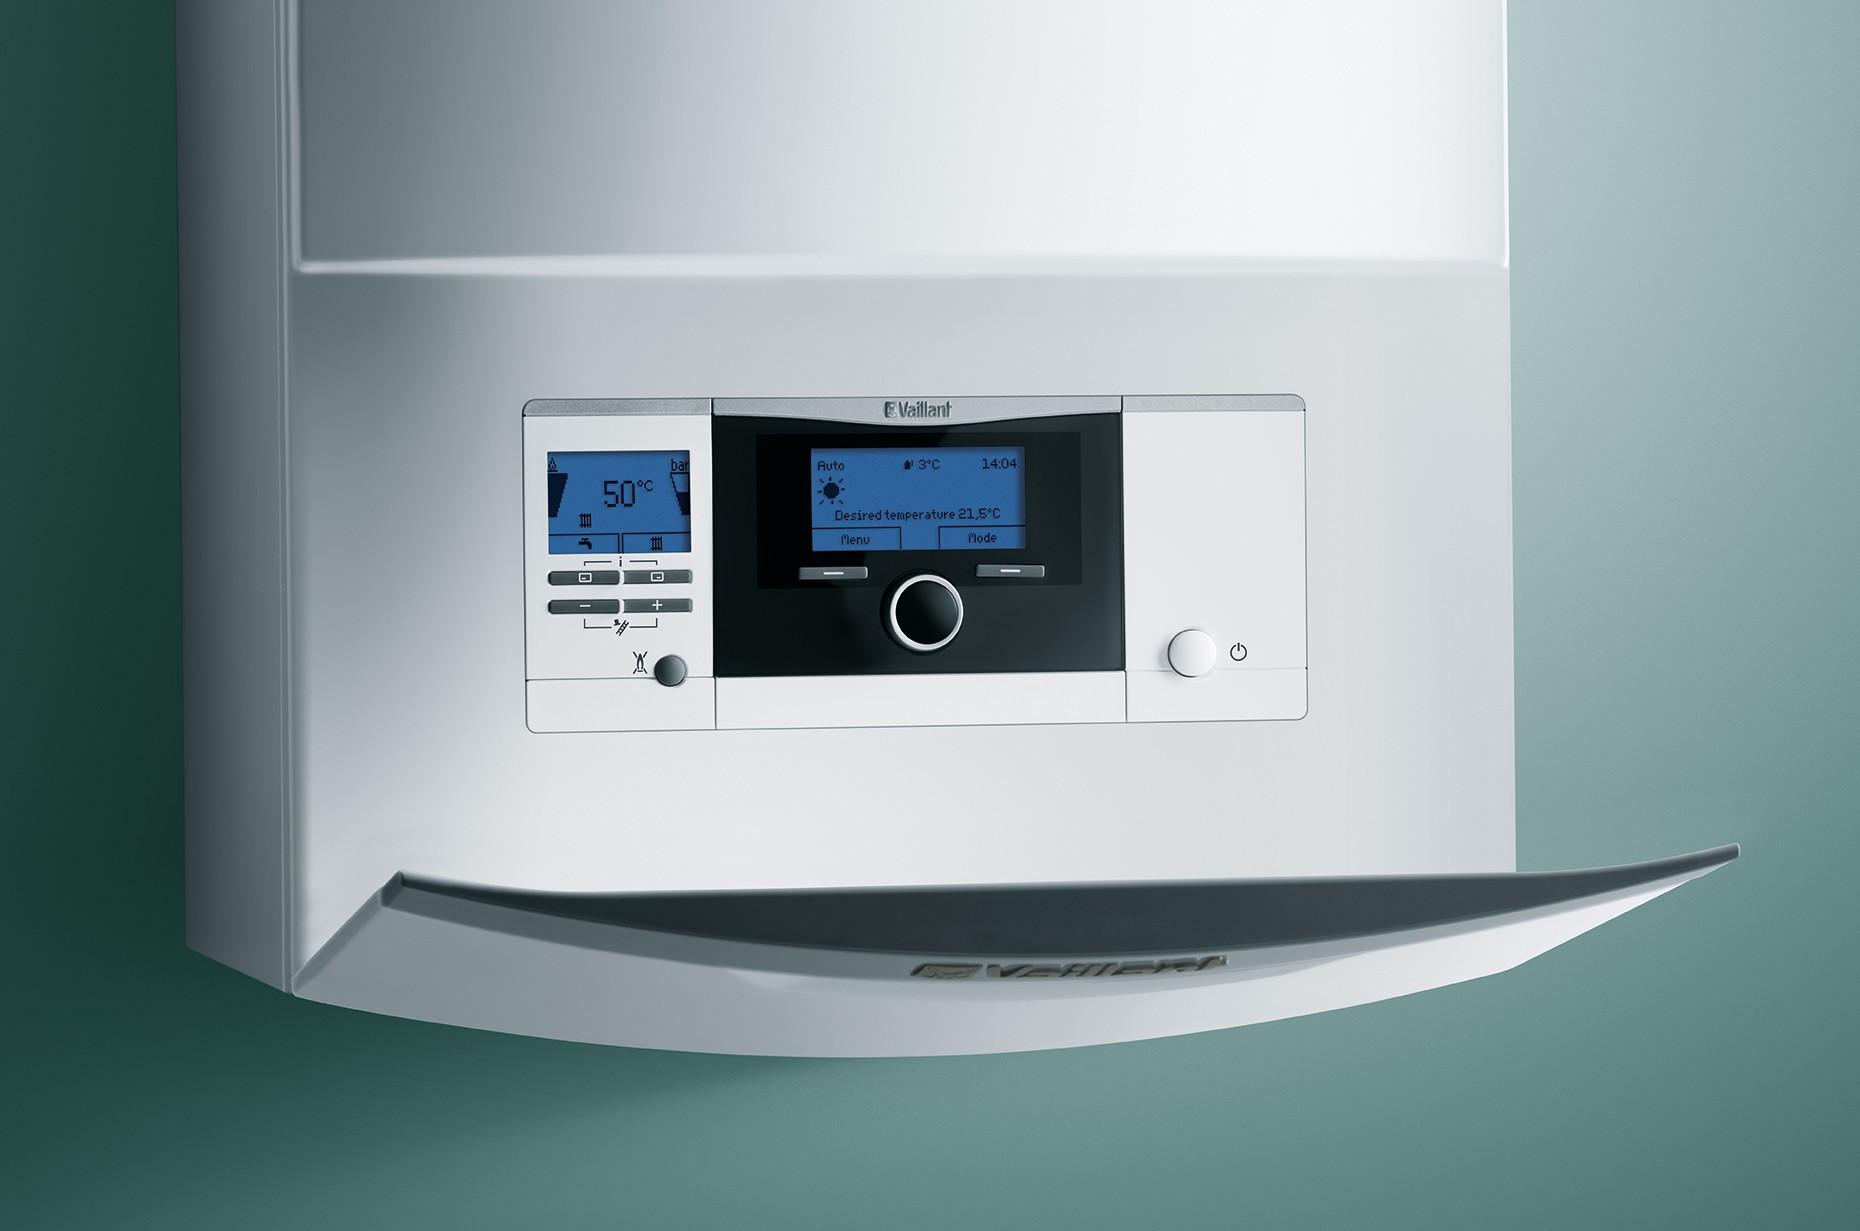 calormatic 470 f kablosuz d hava duyargal. Black Bedroom Furniture Sets. Home Design Ideas